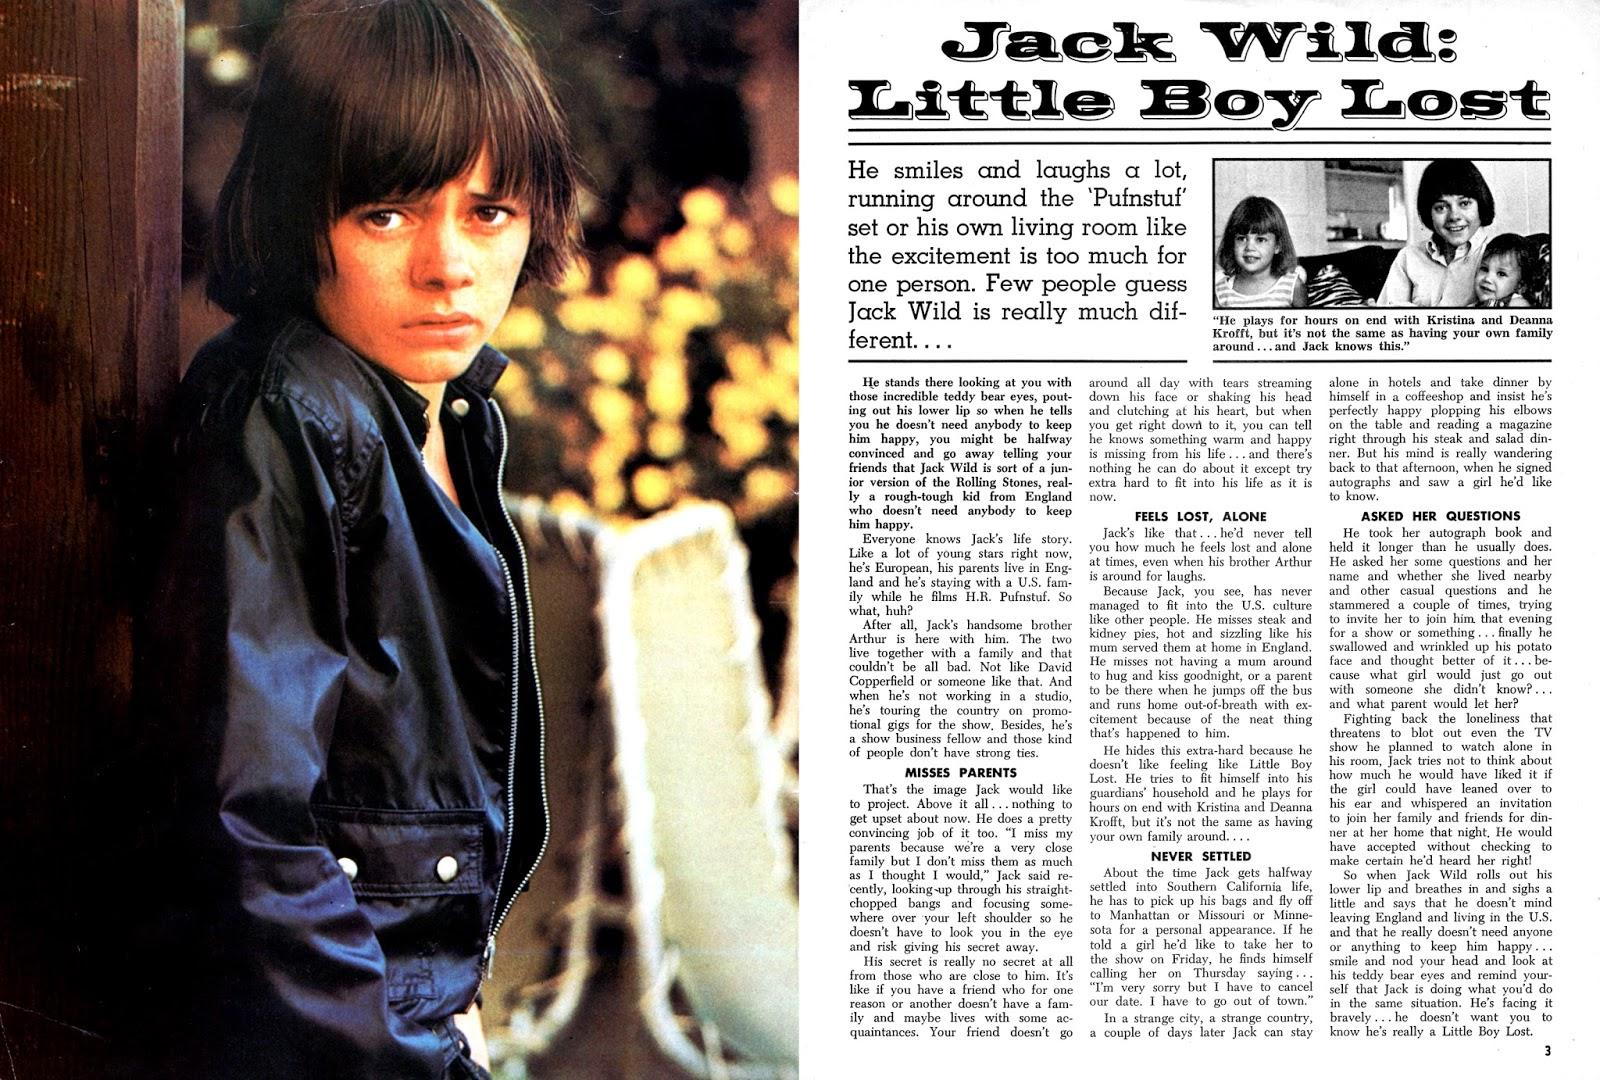 jack wild life downloadjack wild and mark lester, jack wild life, jack wild, jack wild actor, jack wild imdb, jack wild casino, jack wild i'd do anything, jack wild arms, jack wild life lyrics, jack wild life mp3, jack wild life download, jack wild robin hood, jack wild images, jack wild interview, jack wild cancer, jack wild now, jack wild melody, jack wild height, jack wild grave, jack wild biography